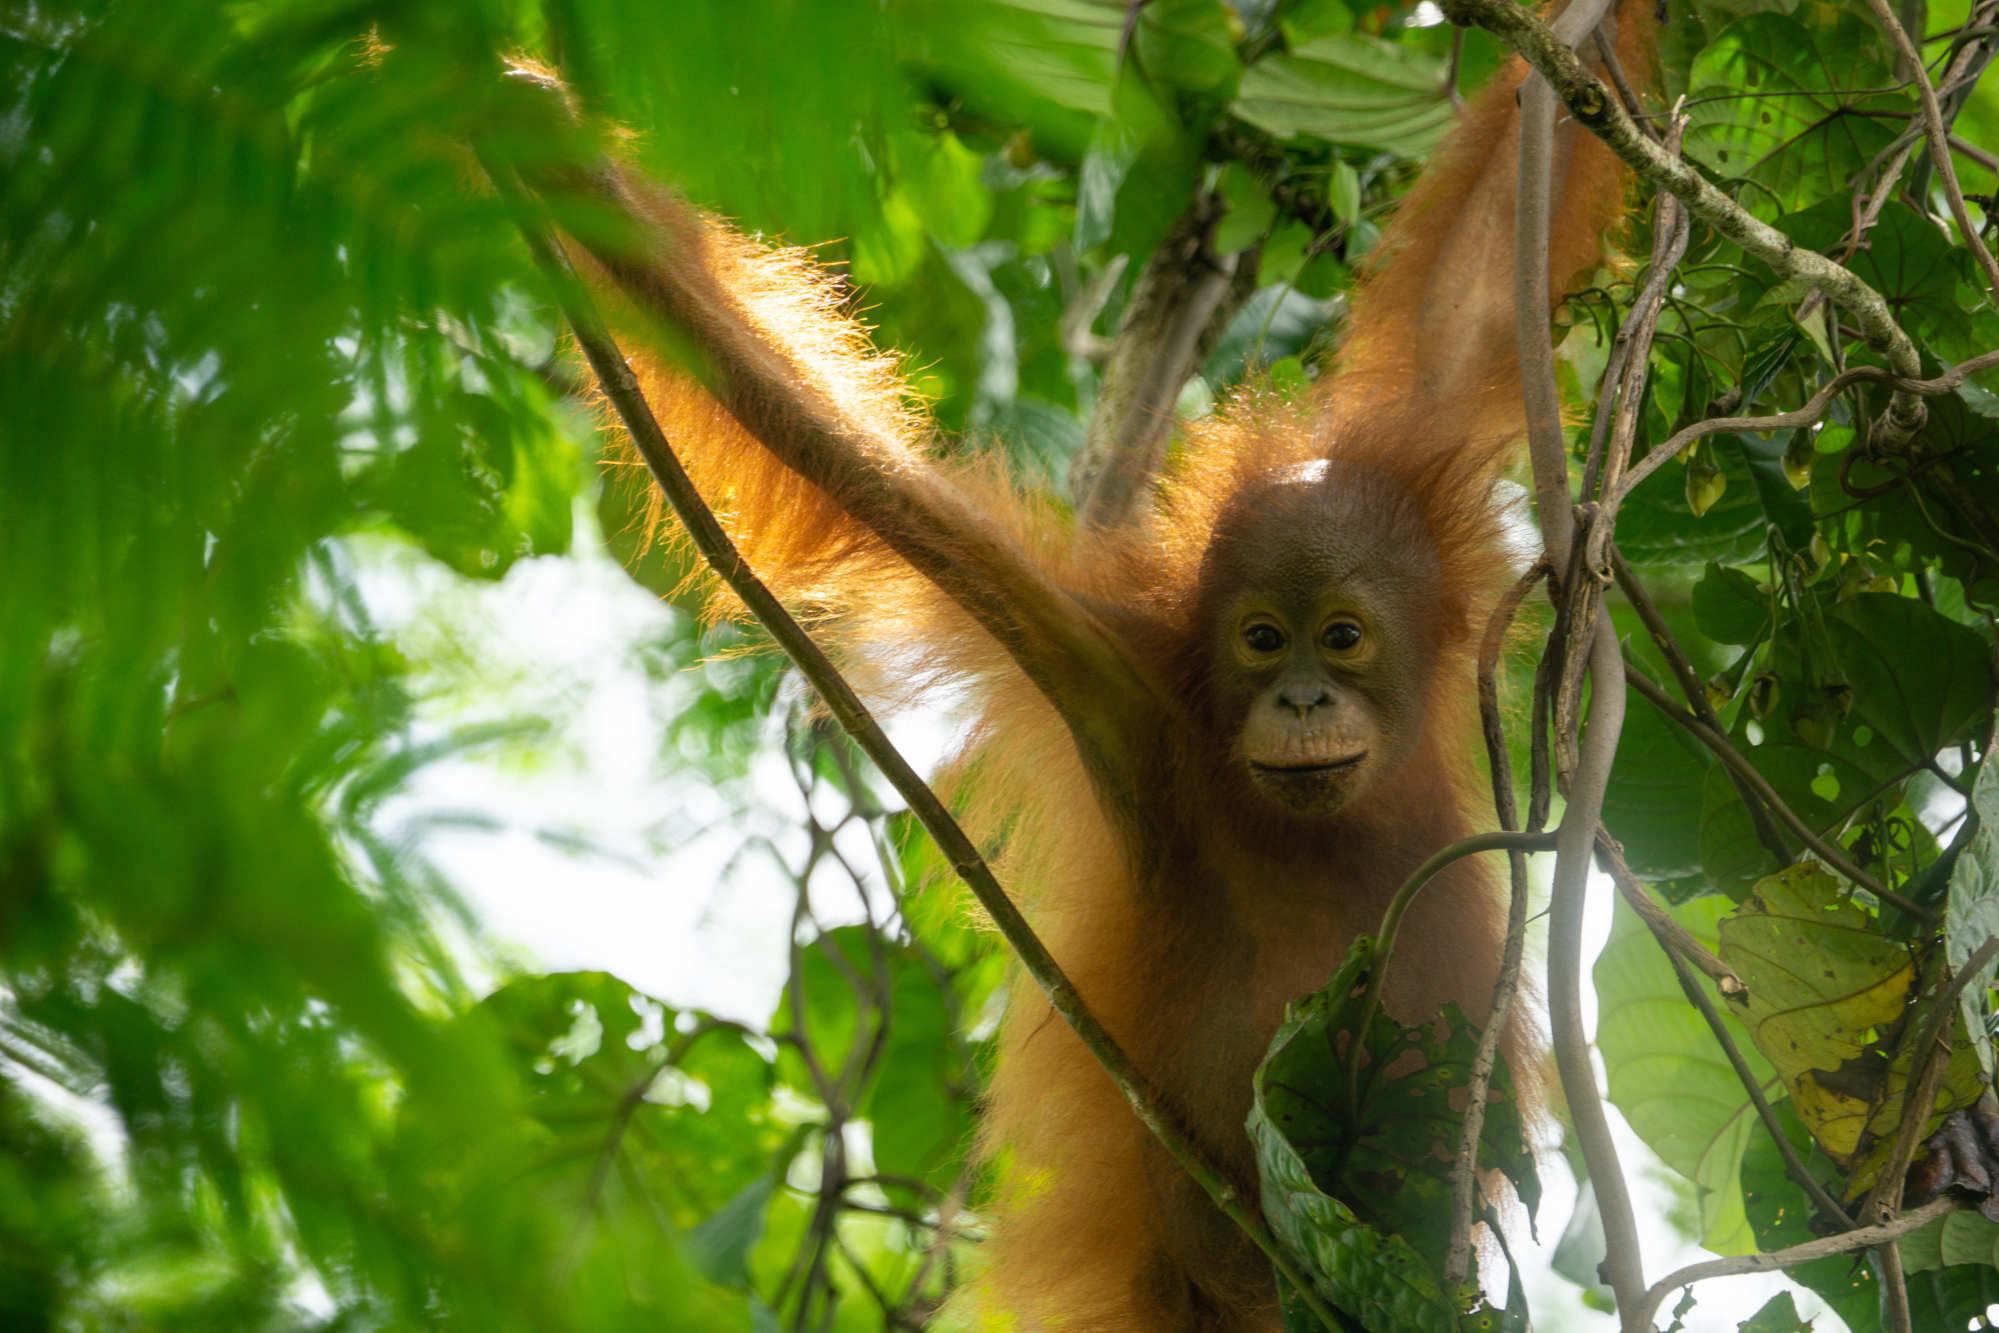 A young orangutan at Bukit Piton Forest Reserve. Photo: courtesy of Simon Werren